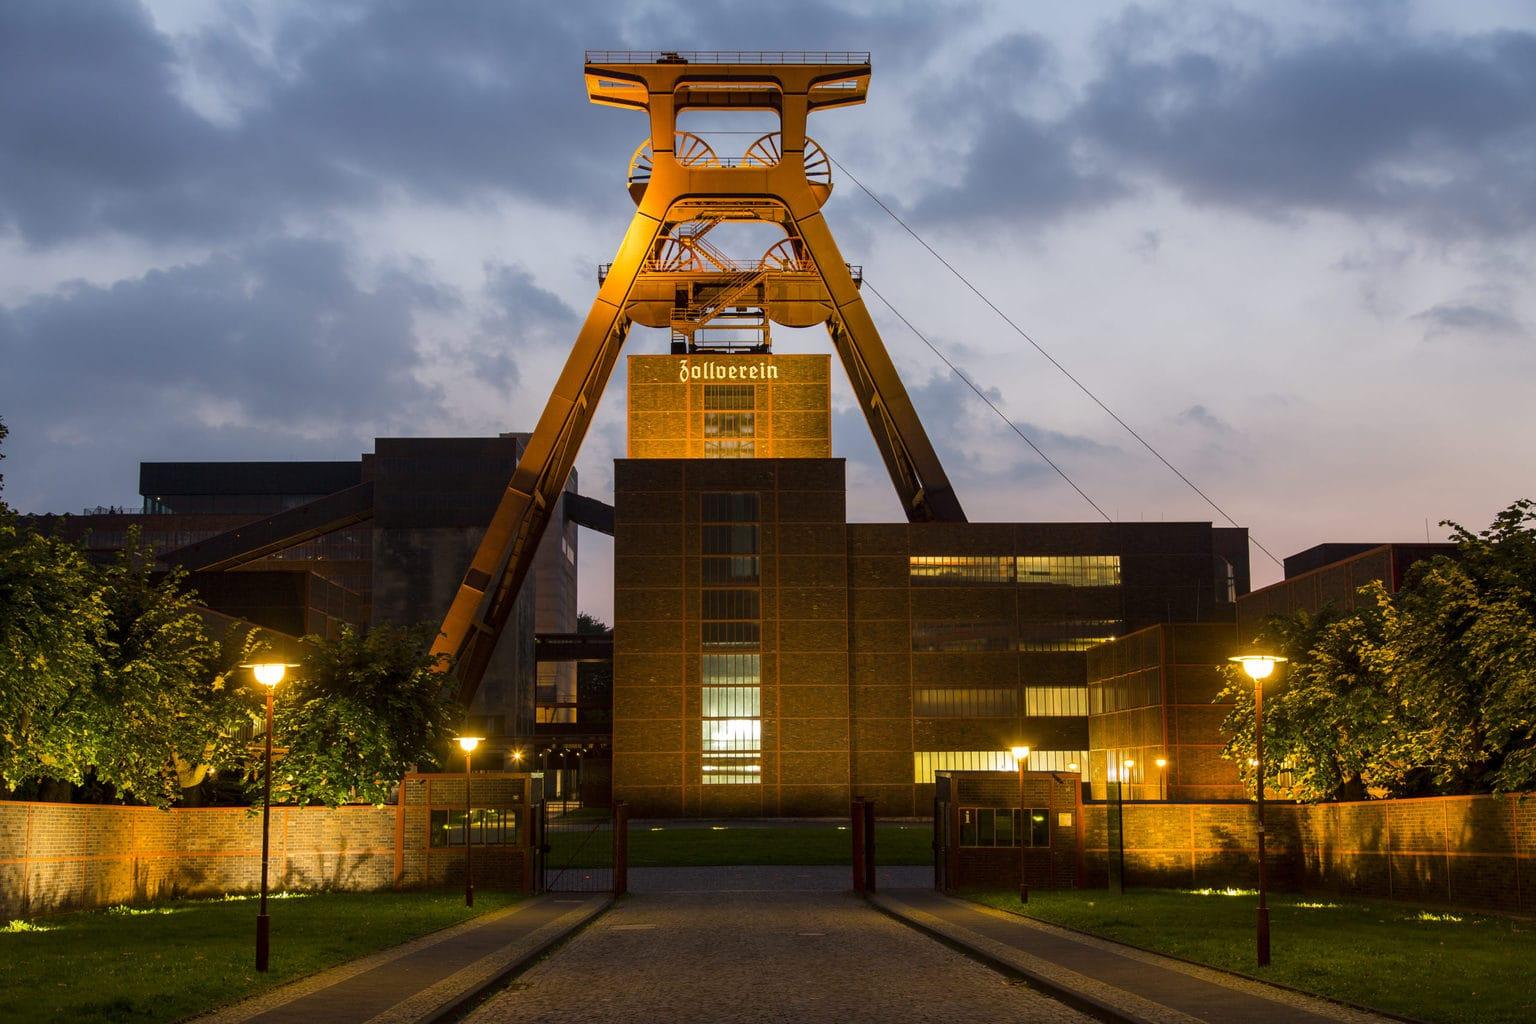 Werelderfgoed-Zeche-Zollverein-in-Essen-schachttoren-in-het-avondlicht